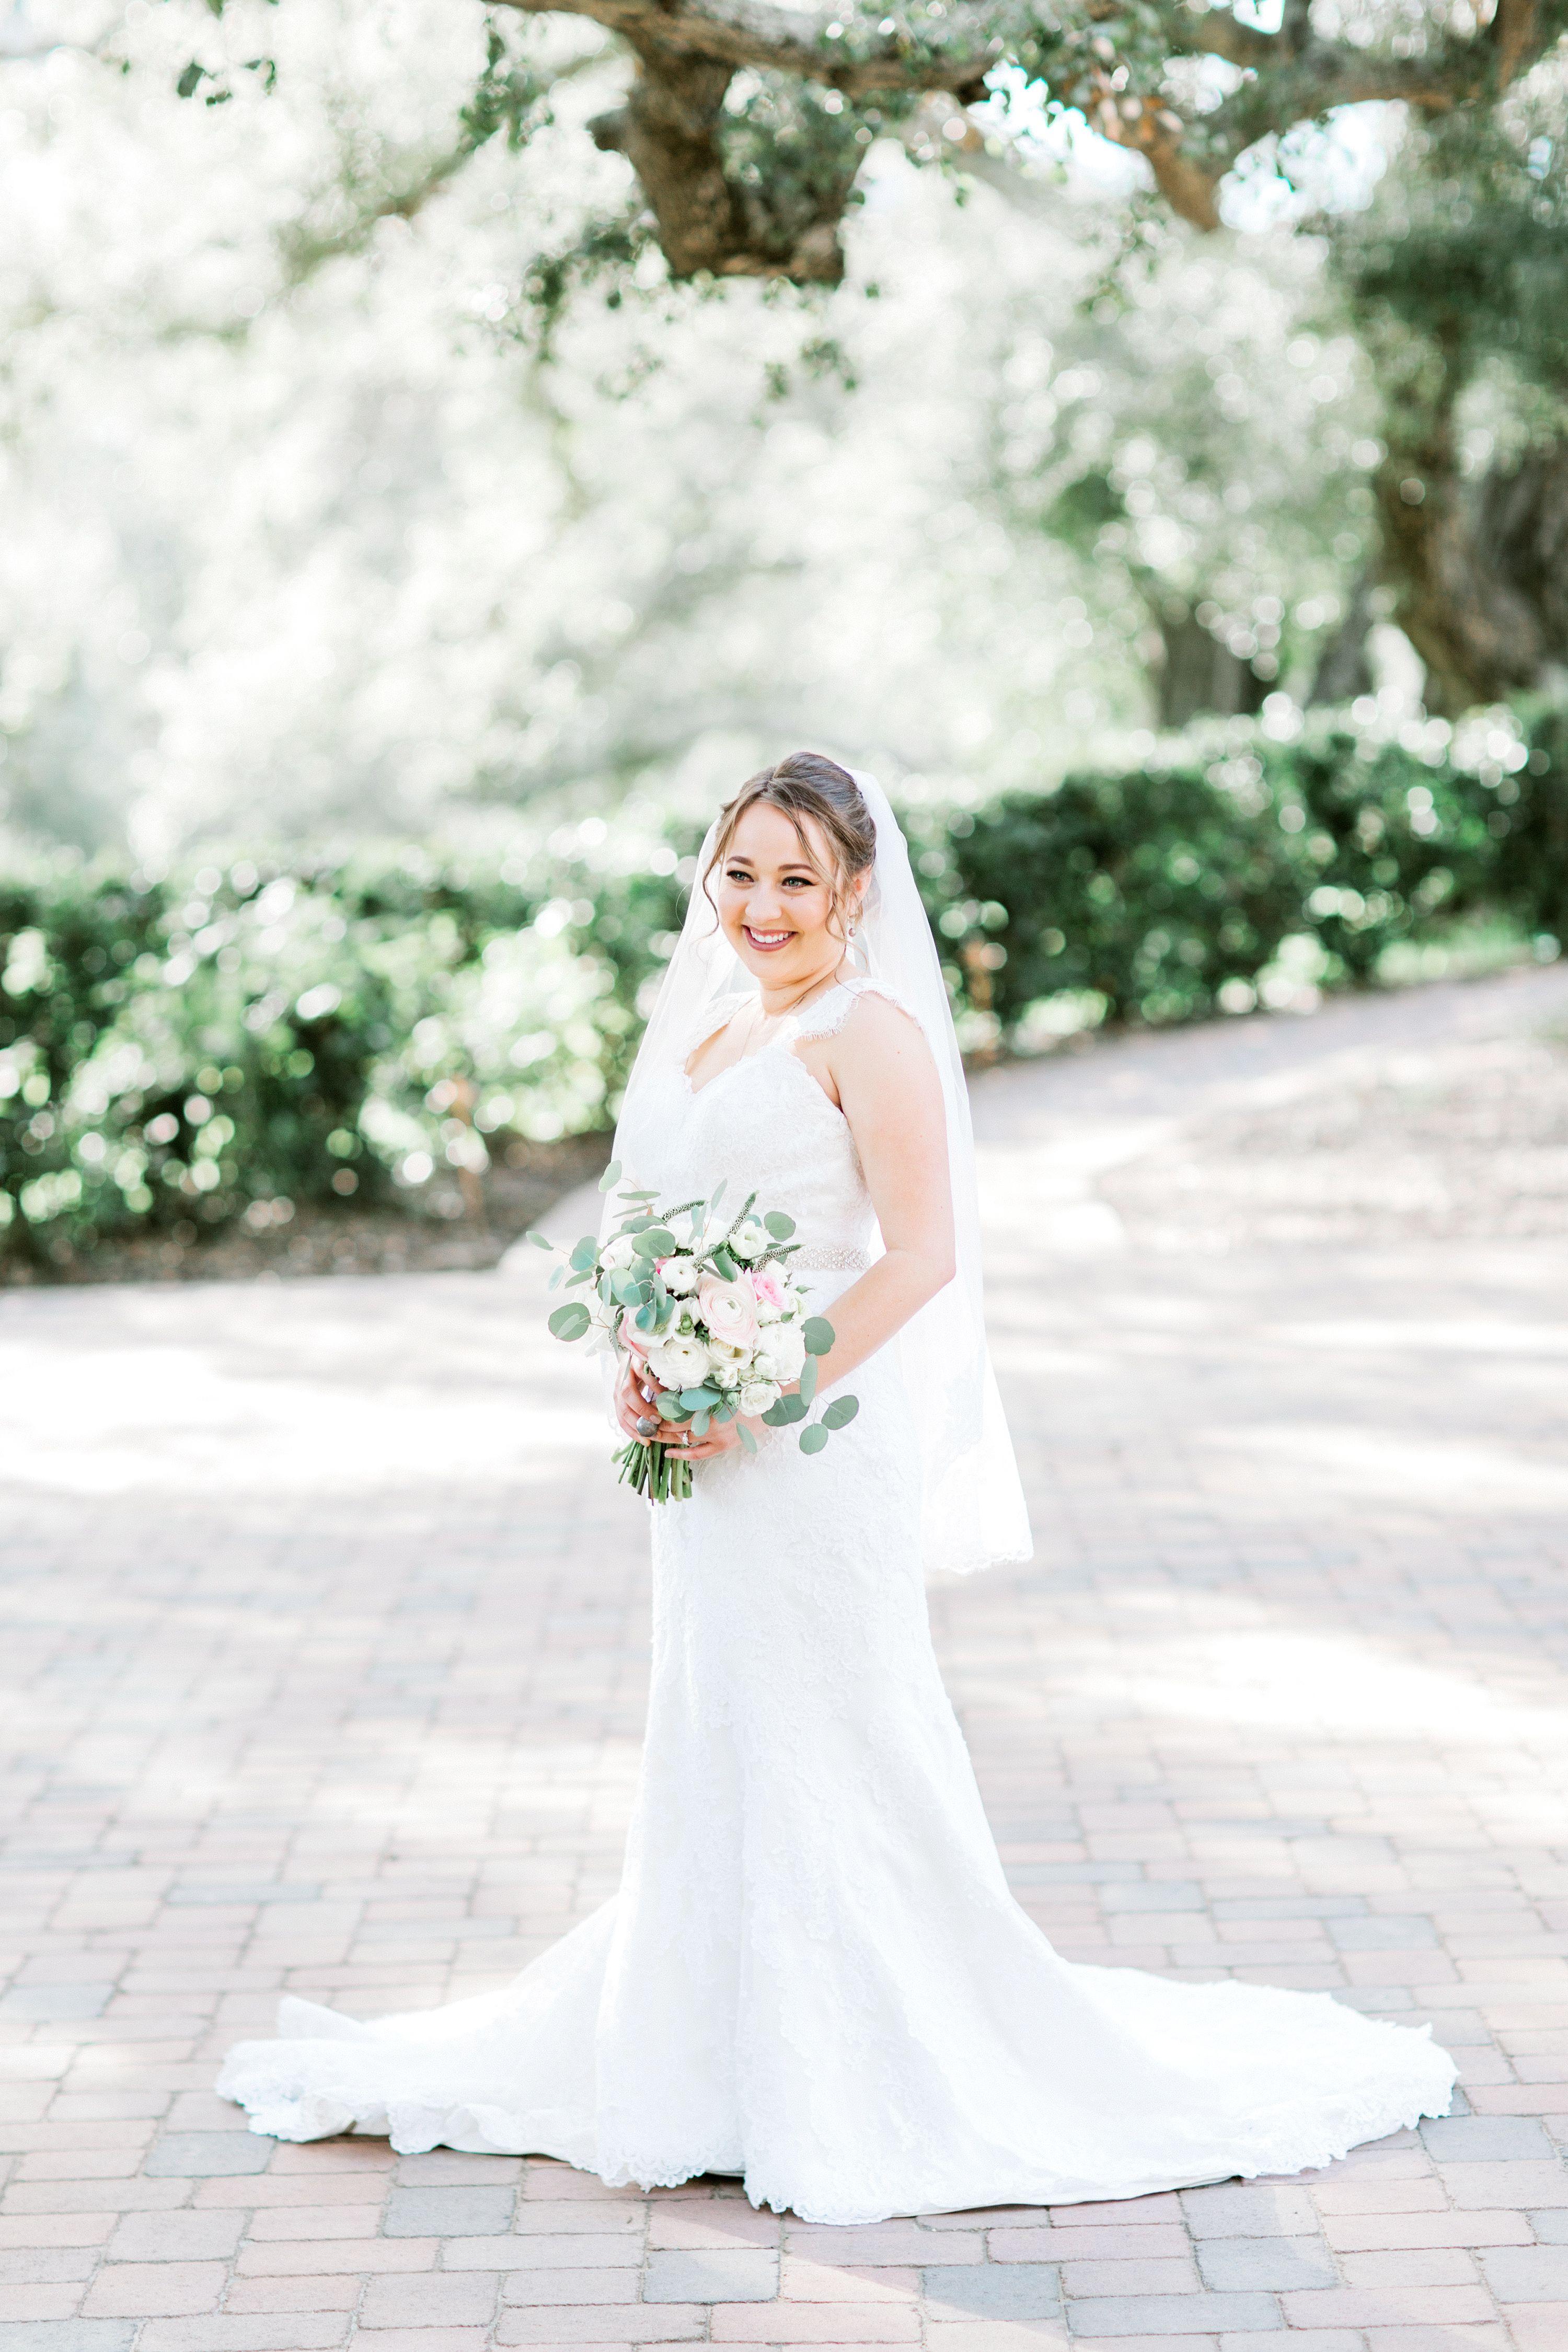 The bustle wedding dresses  Stella York at The Bustle Del Mar  Bustle Brides  Pinterest